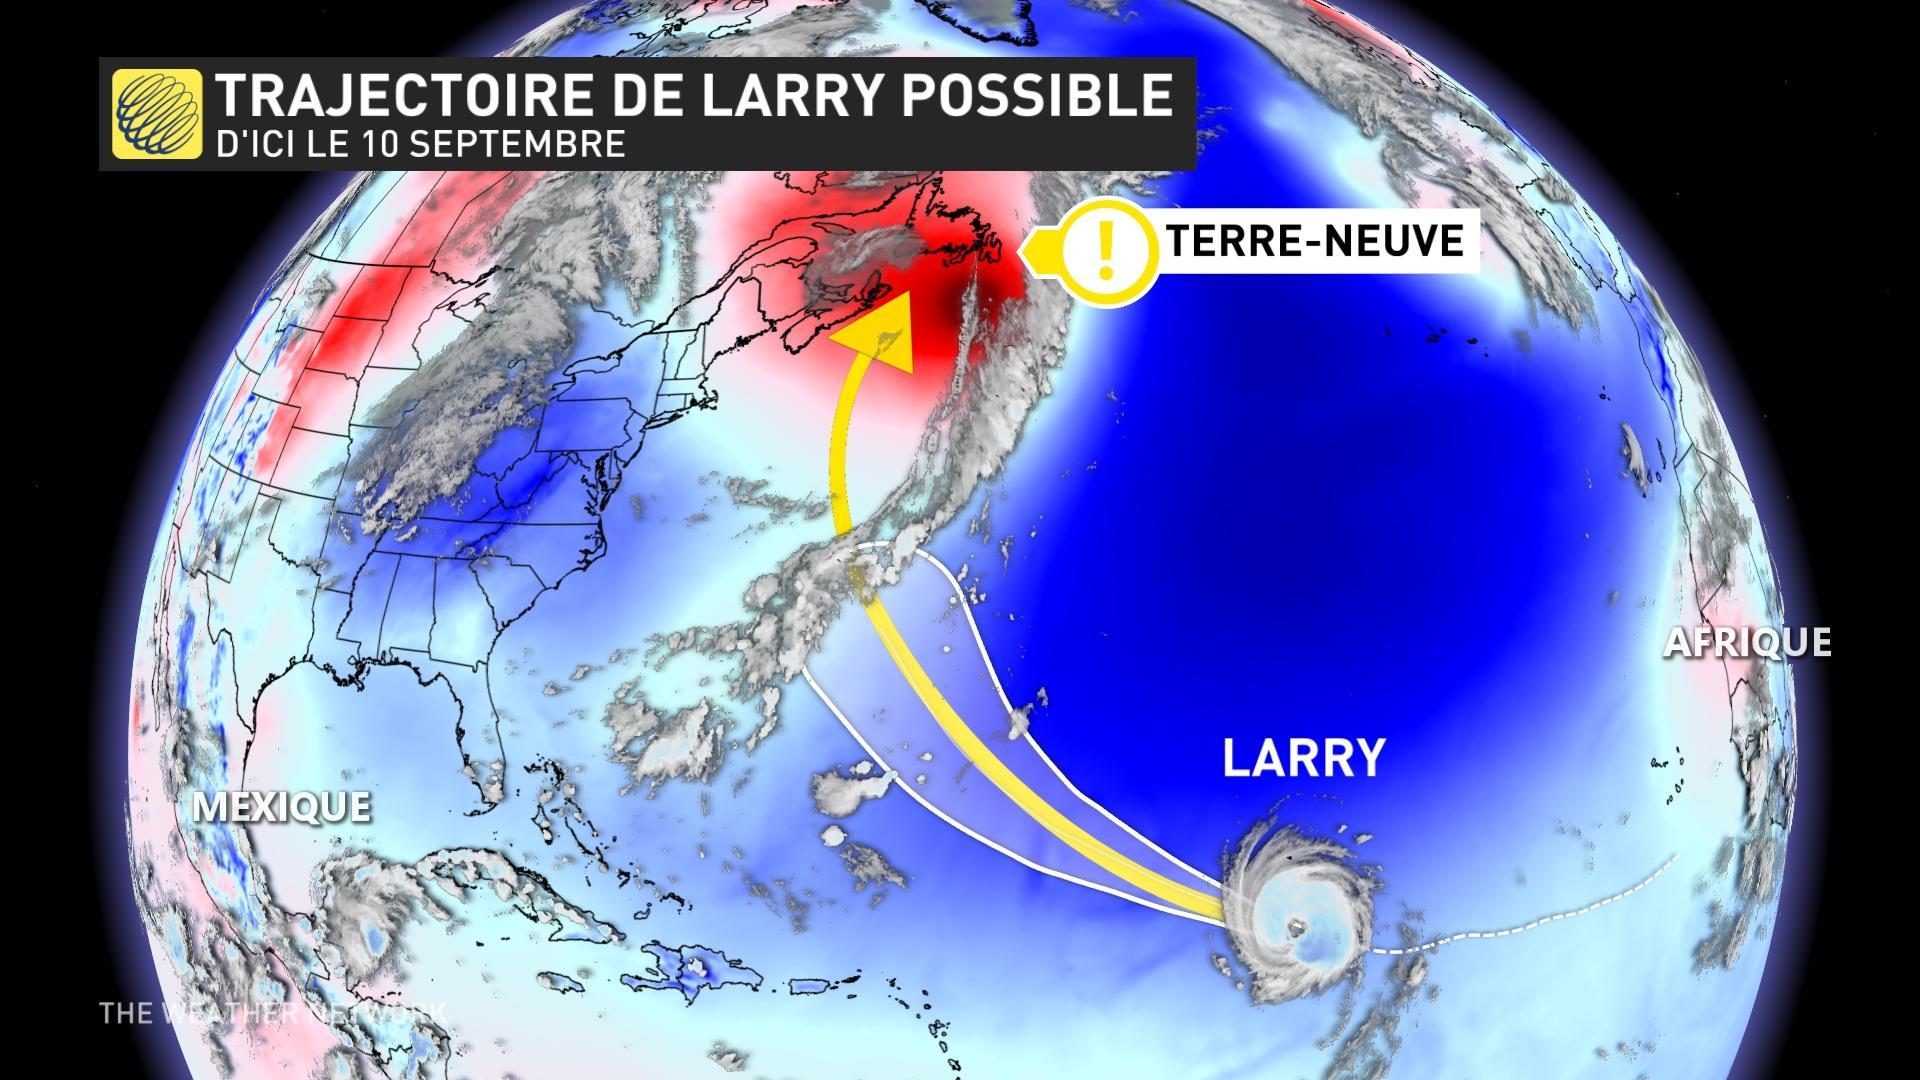 Larry possible final trajectory